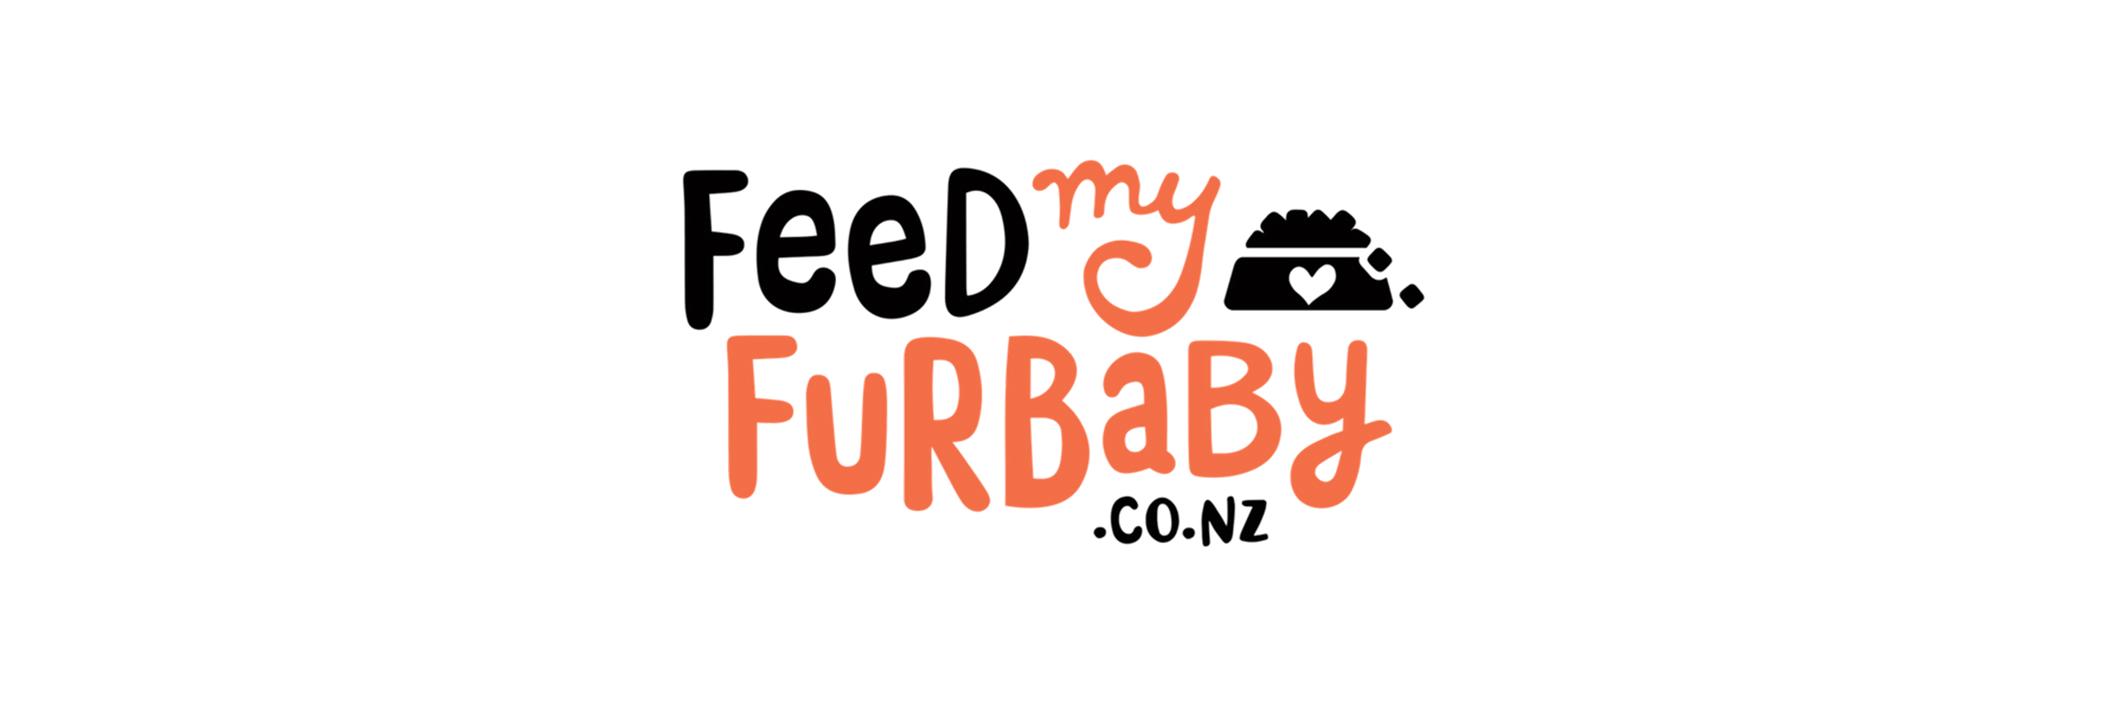 furbaby logo